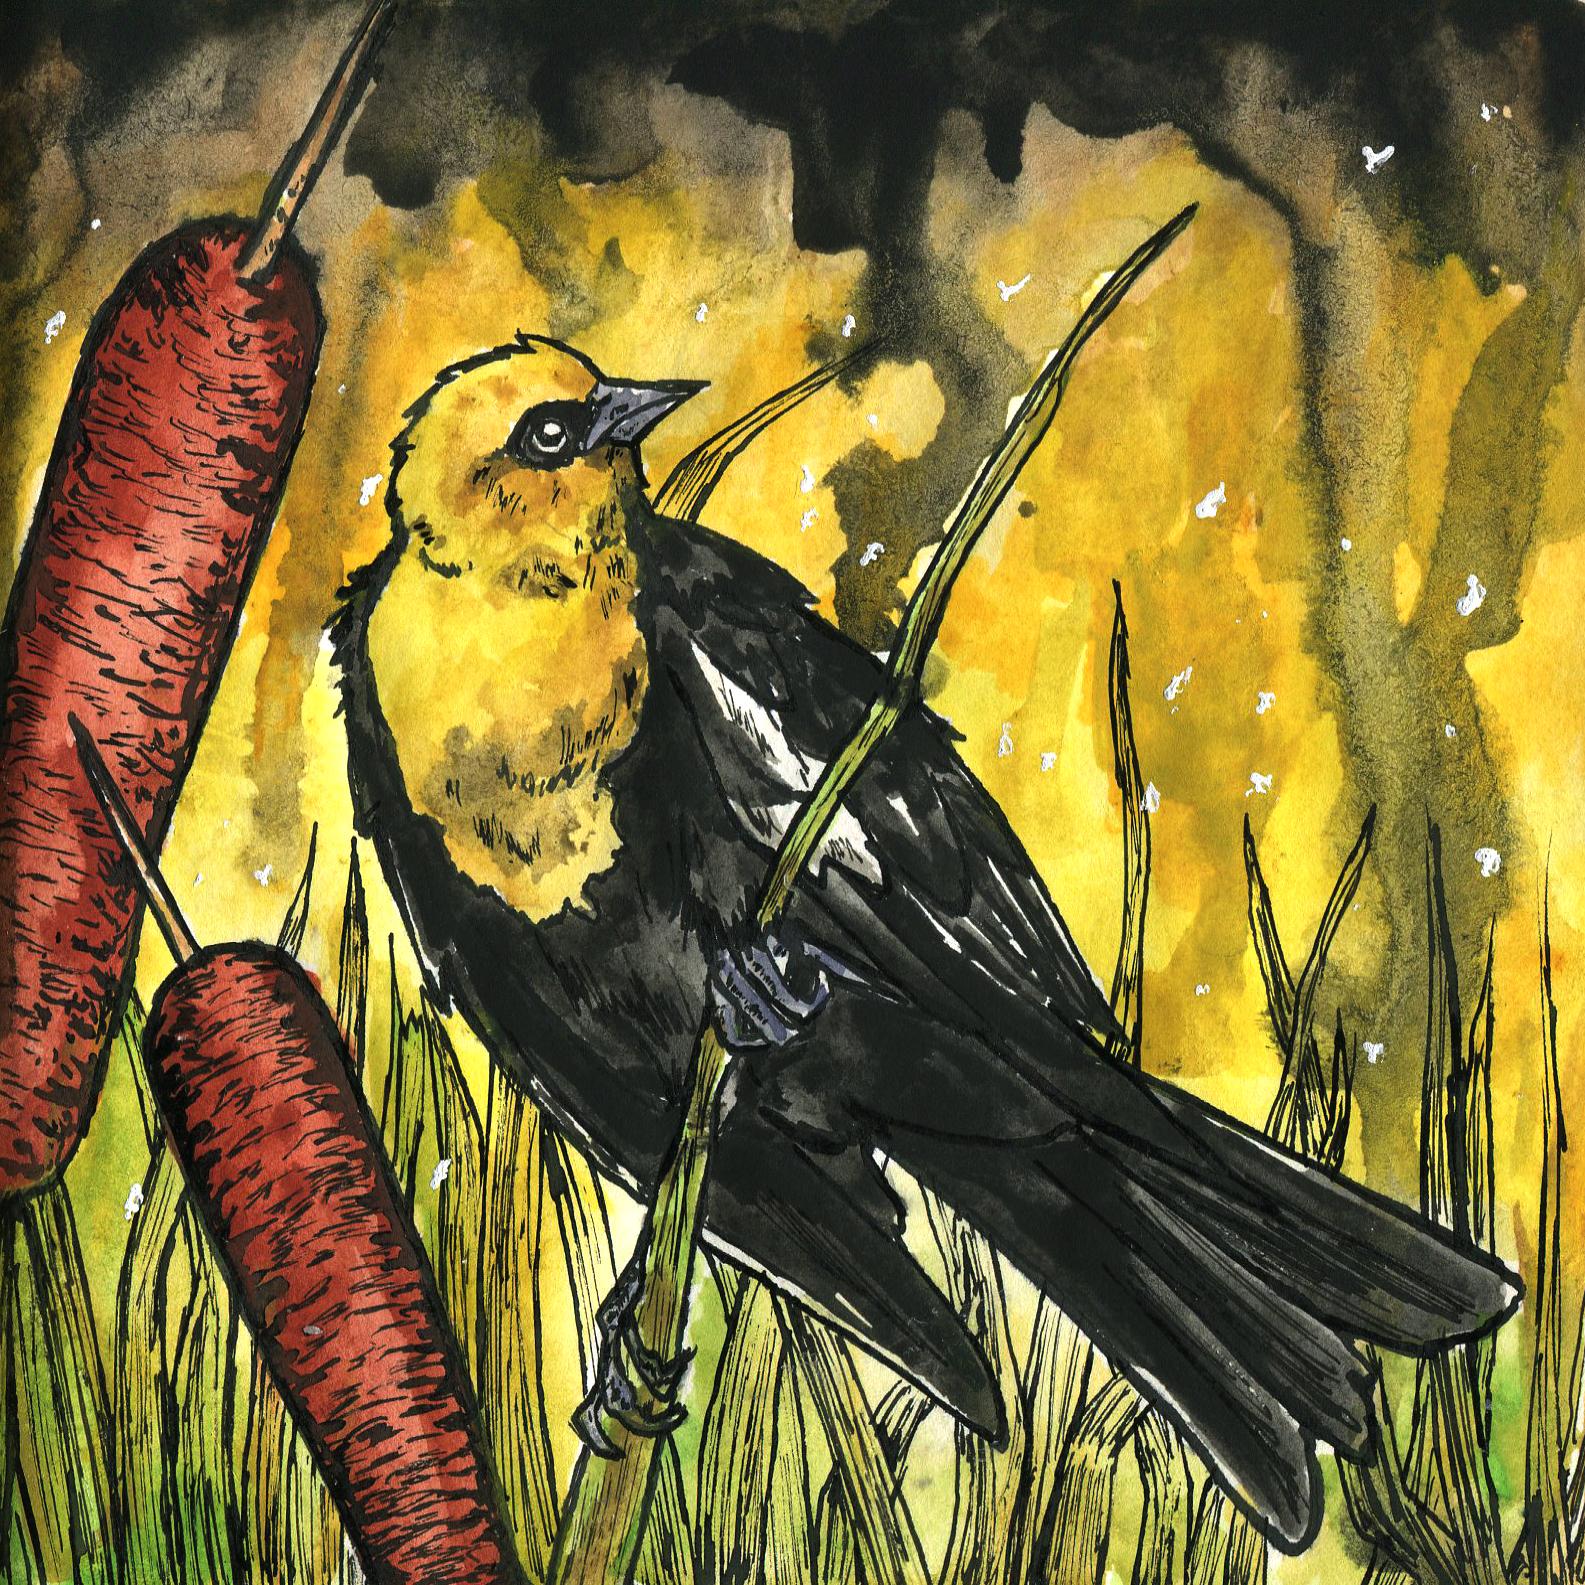 Orioles and Blackbirds